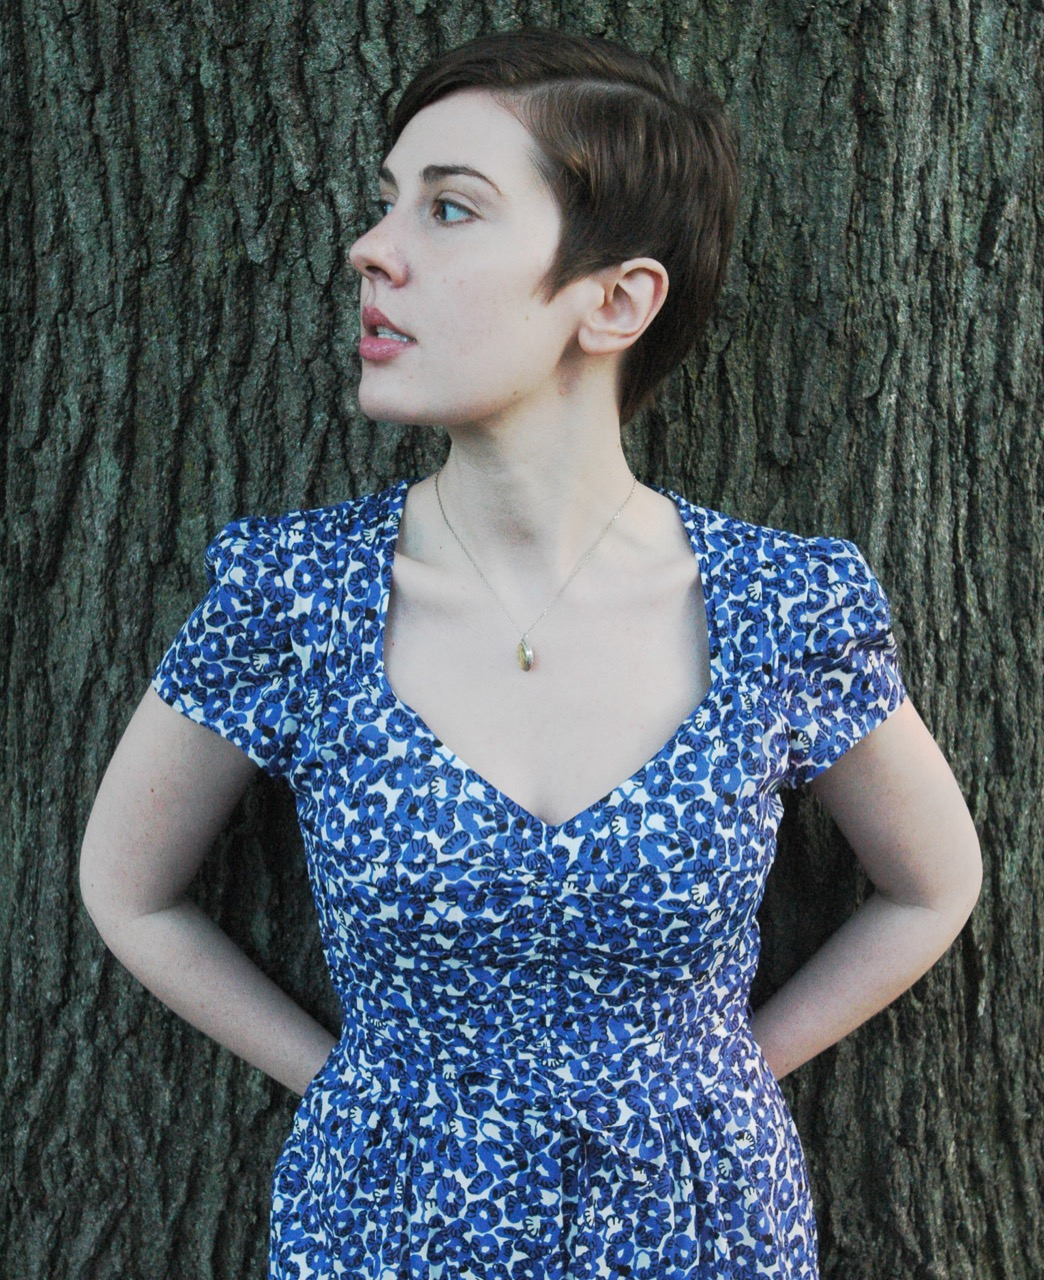 Patricia Lockwood Author Photo (c) Grep Hoax